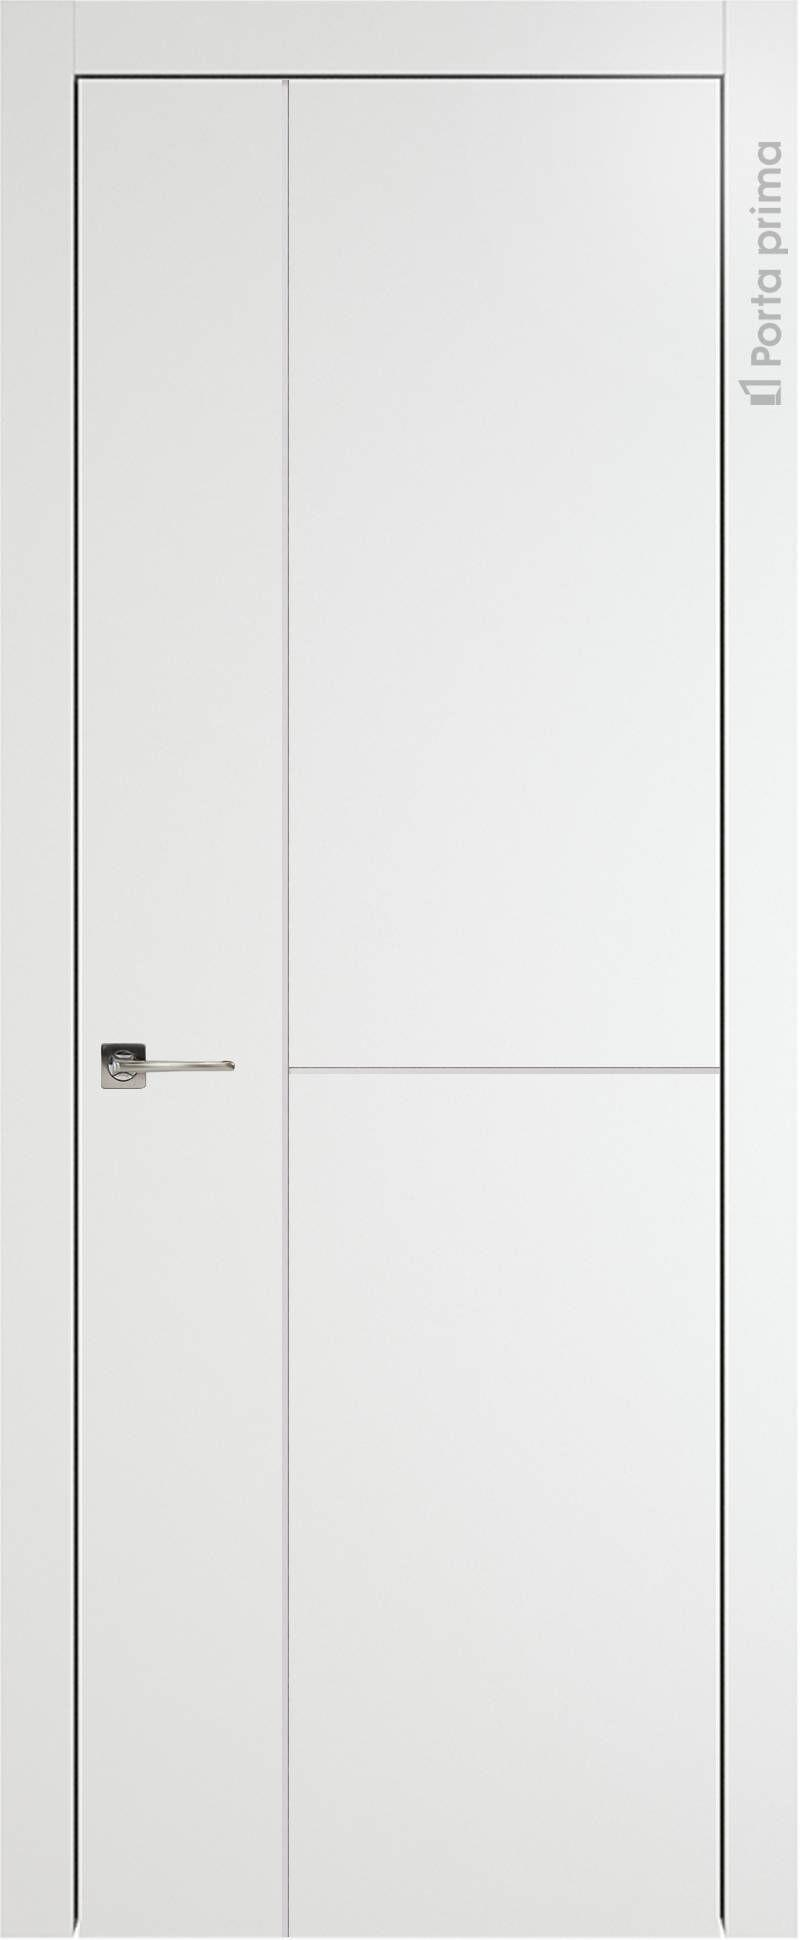 Tivoli Г-1 цвет - Белая эмаль (RAL 9003) Без стекла (ДГ)